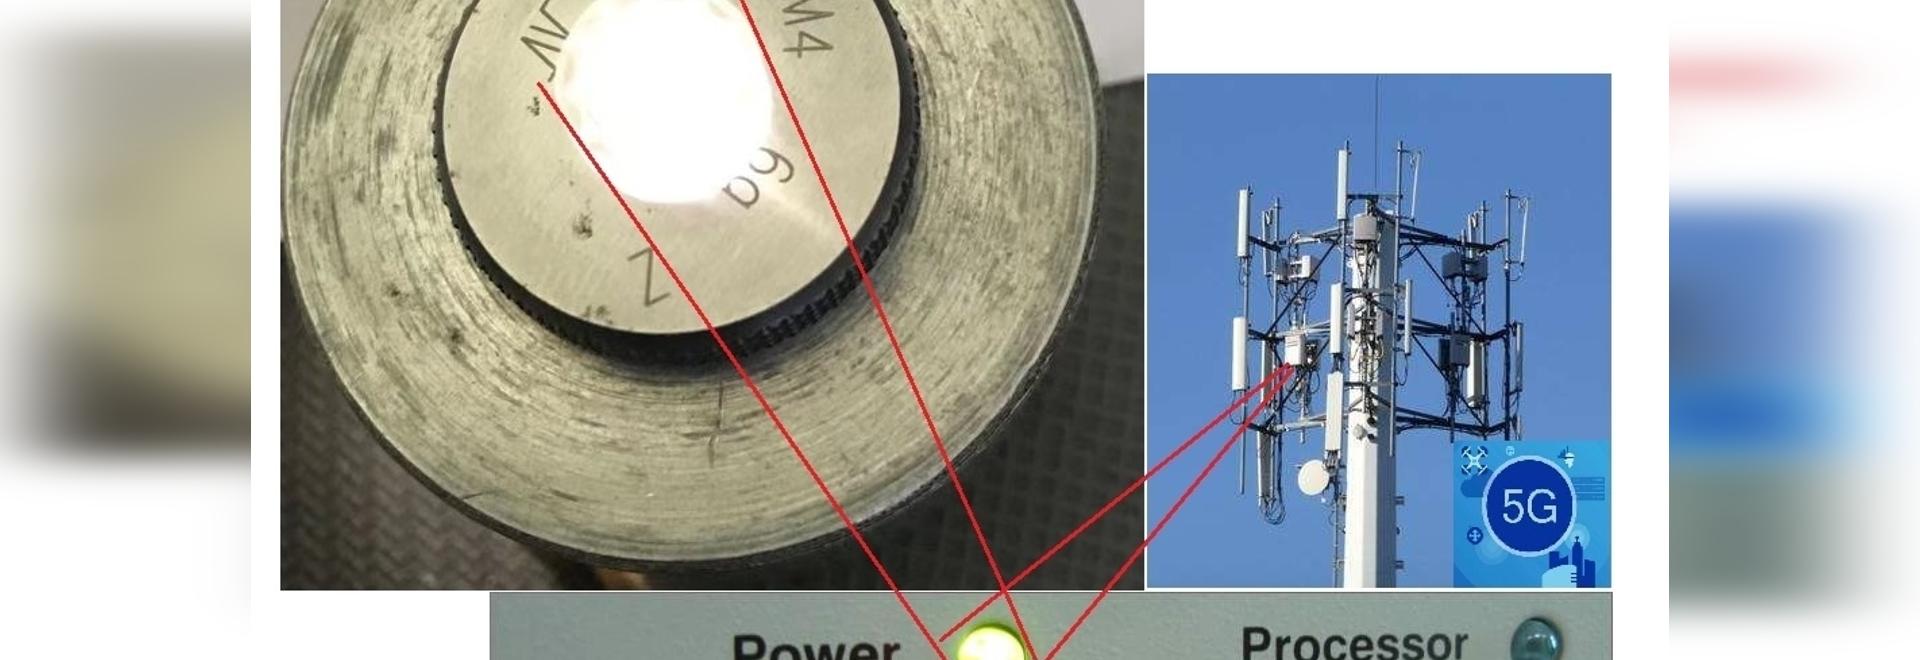 Milvent M4x0.7 Light Guide Pillar Venting Pressure Relief Compensation Air Breathable Screw ELEMENT